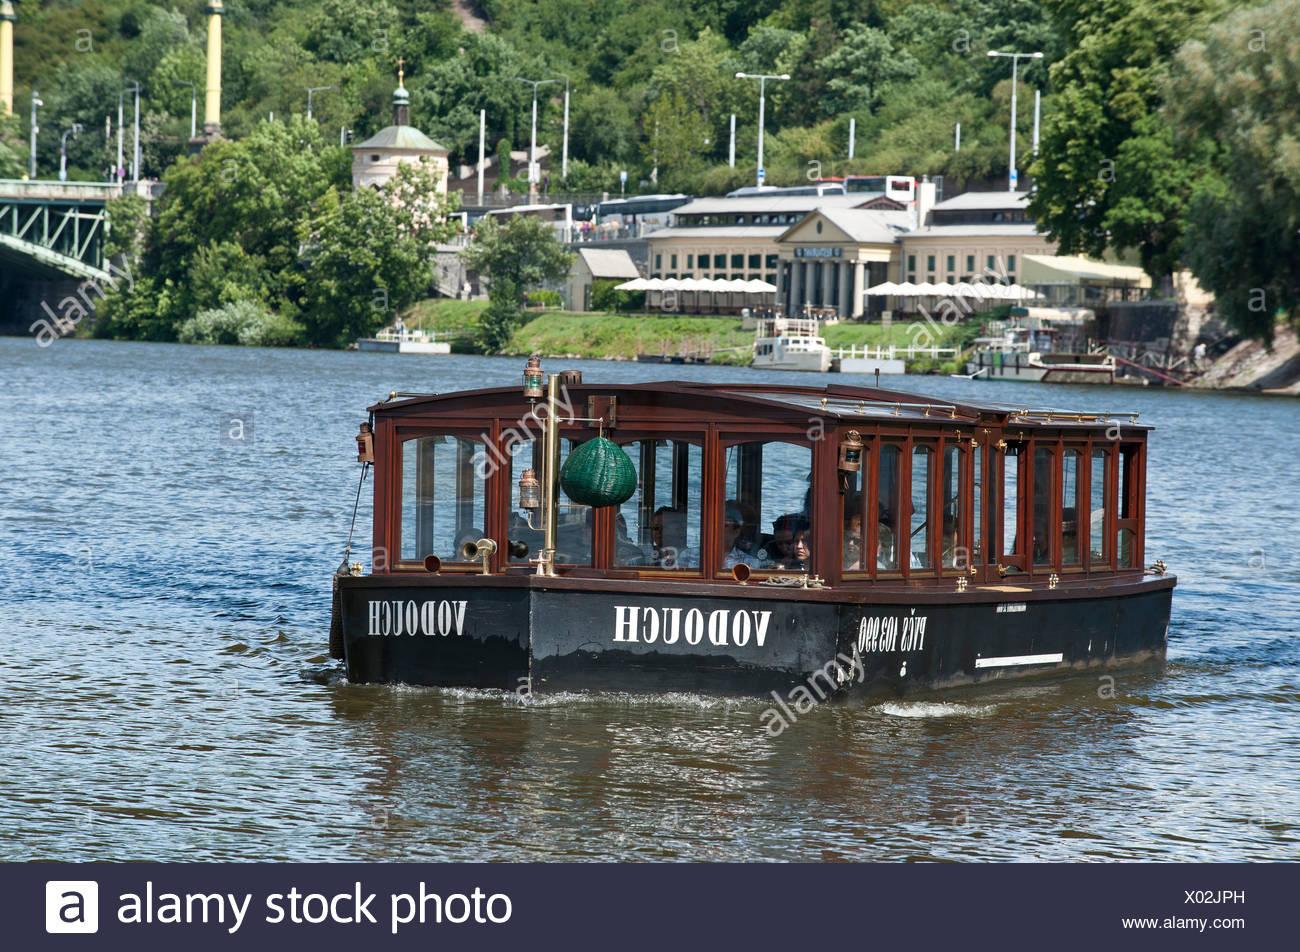 Excursion boat on the Moldau River, Prague, Bohemia, Czech Republic, Europe - Stock Image